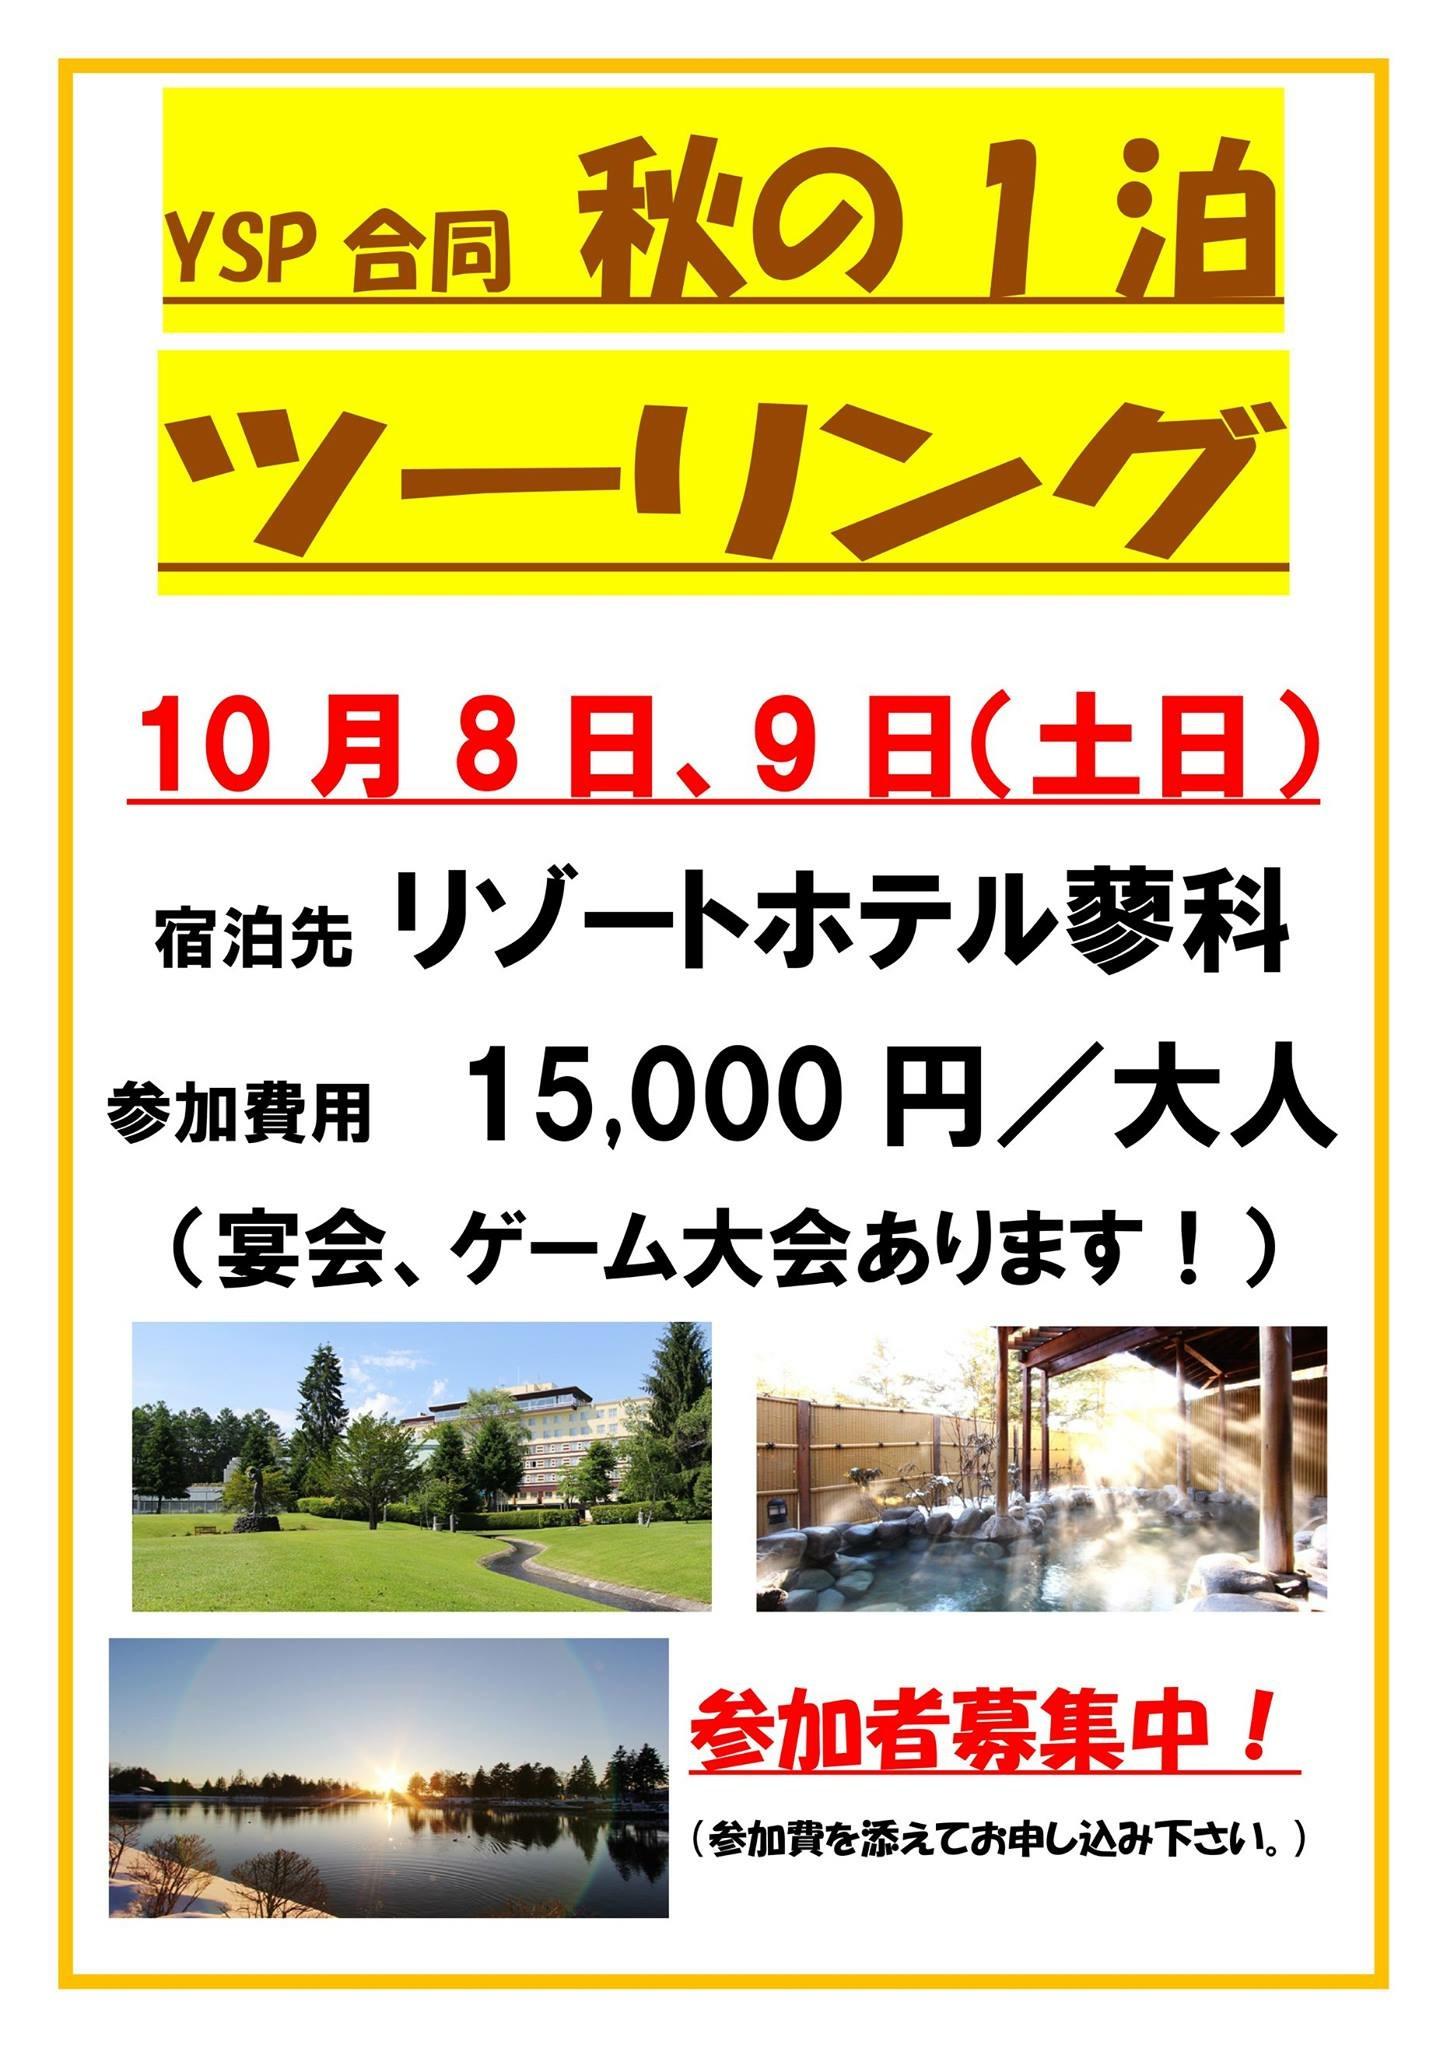 YSP刈谷 YSP合同 秋の一泊ツーリング ご参加者様 募集中!